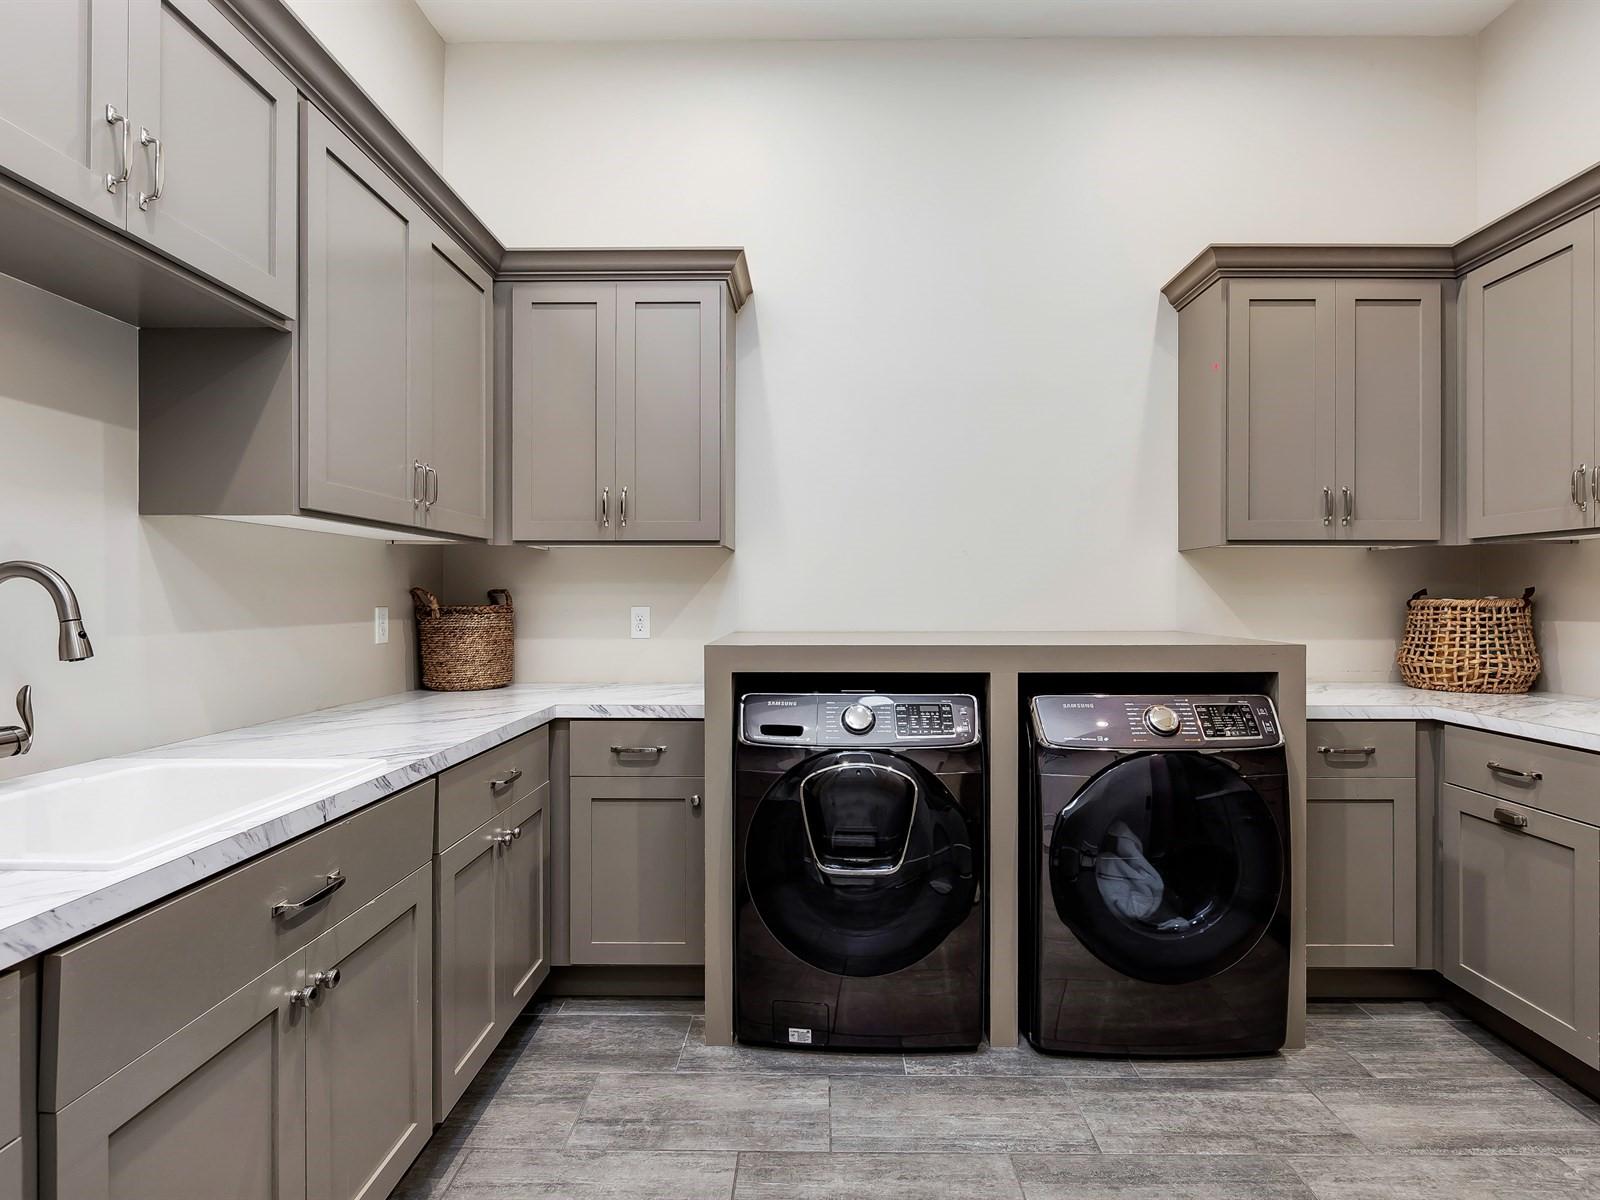 035_Laundry .jpg